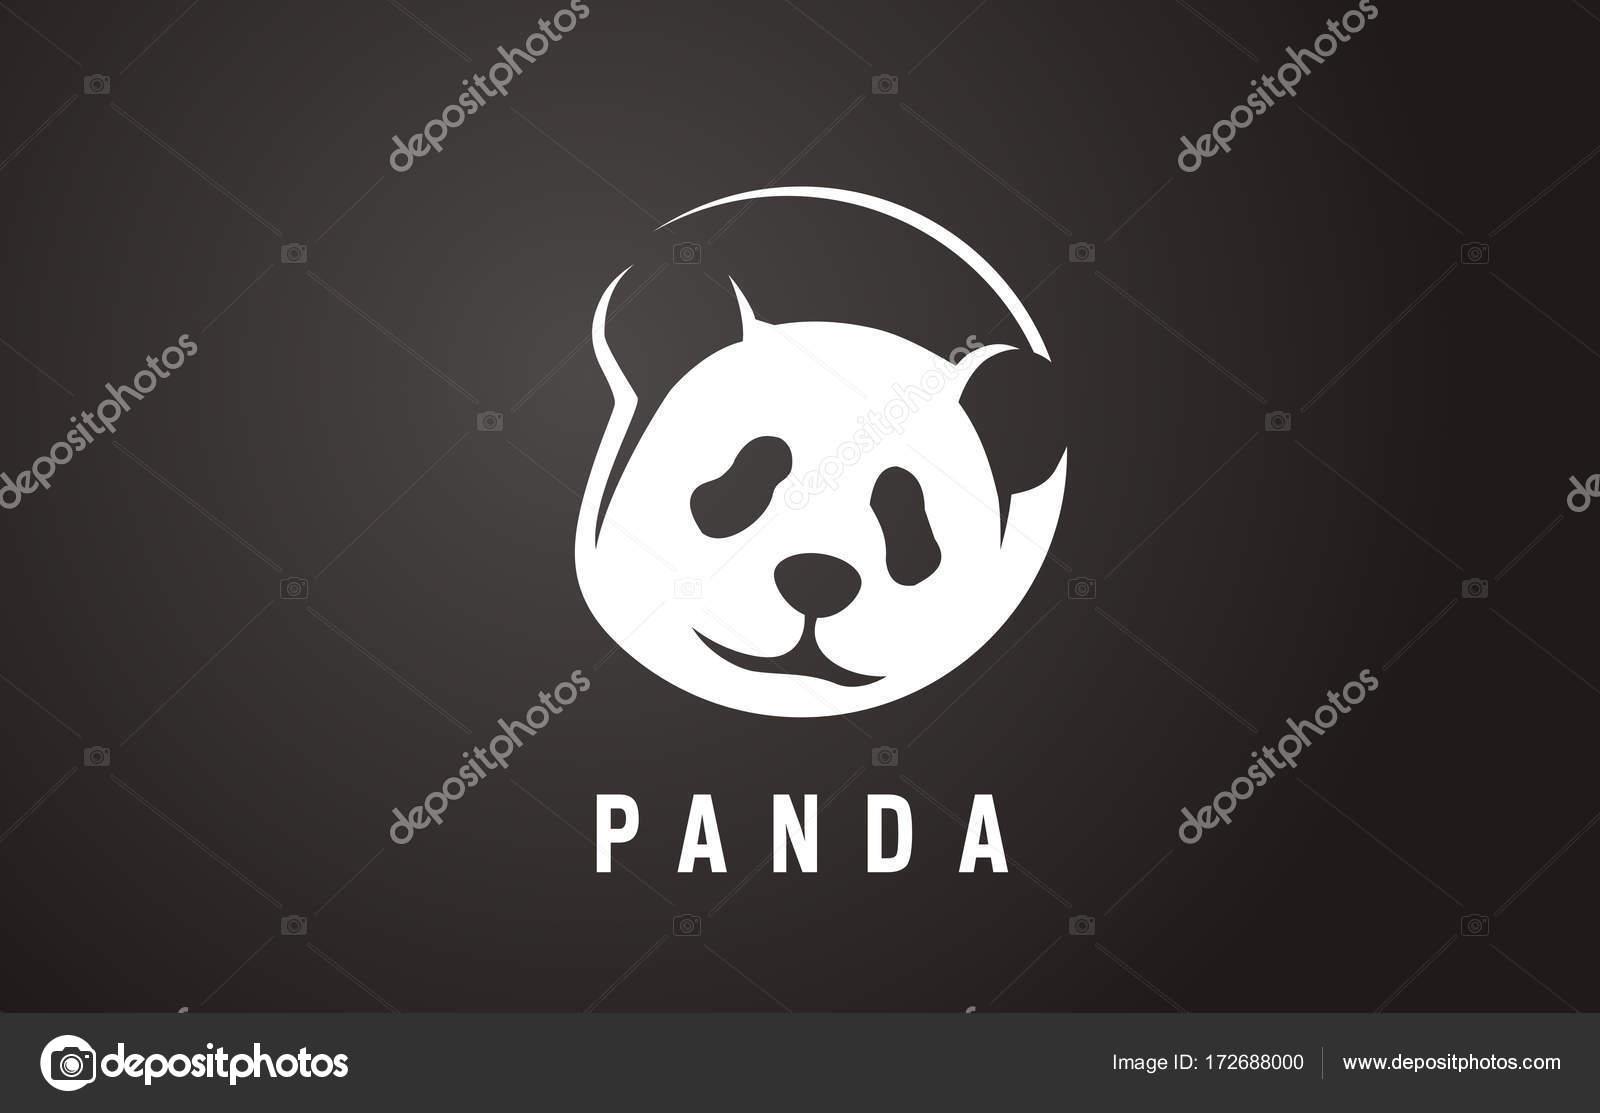 Pandas face logo in the negative space panda logo logo for pandas face logo in the negative space panda logo logo for animal protection biocorpaavc Images